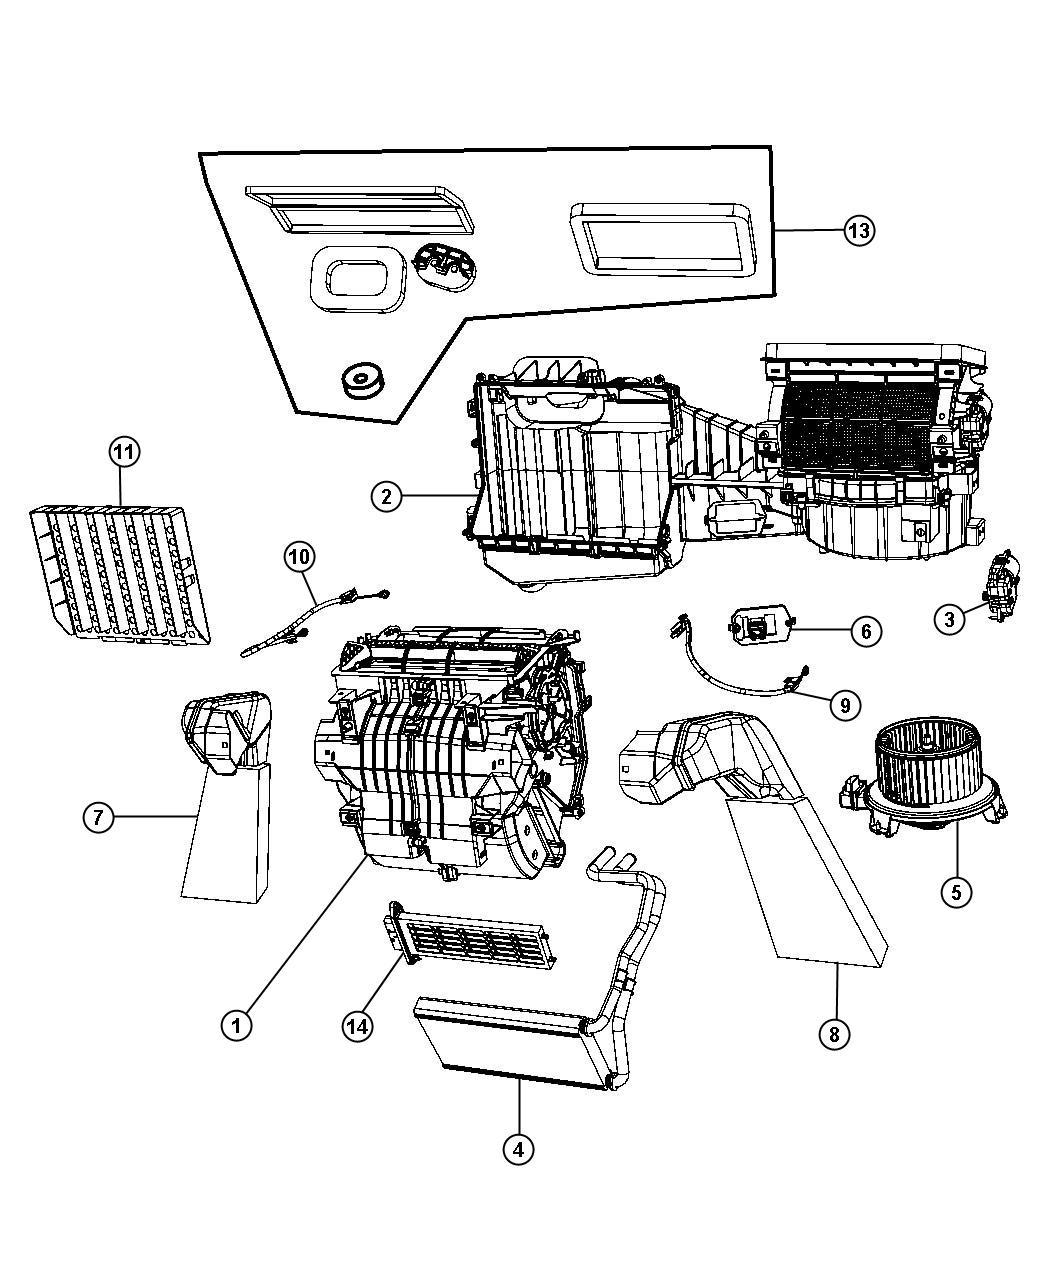 2010 jeep wrangler housing  blower motor  evaporator  drain  doors